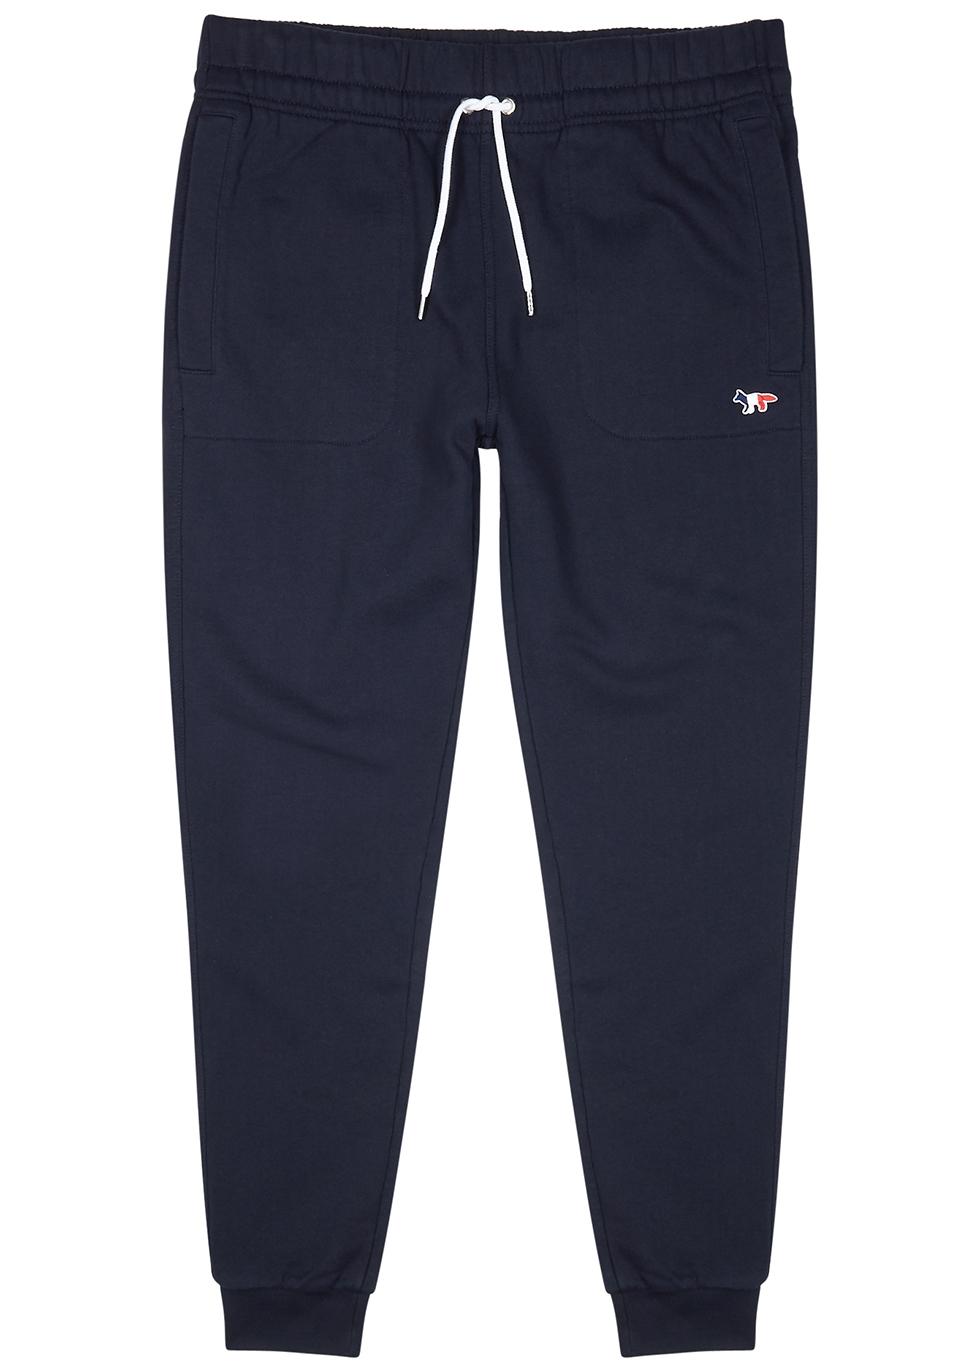 Navy cotton-jersey sweatpants